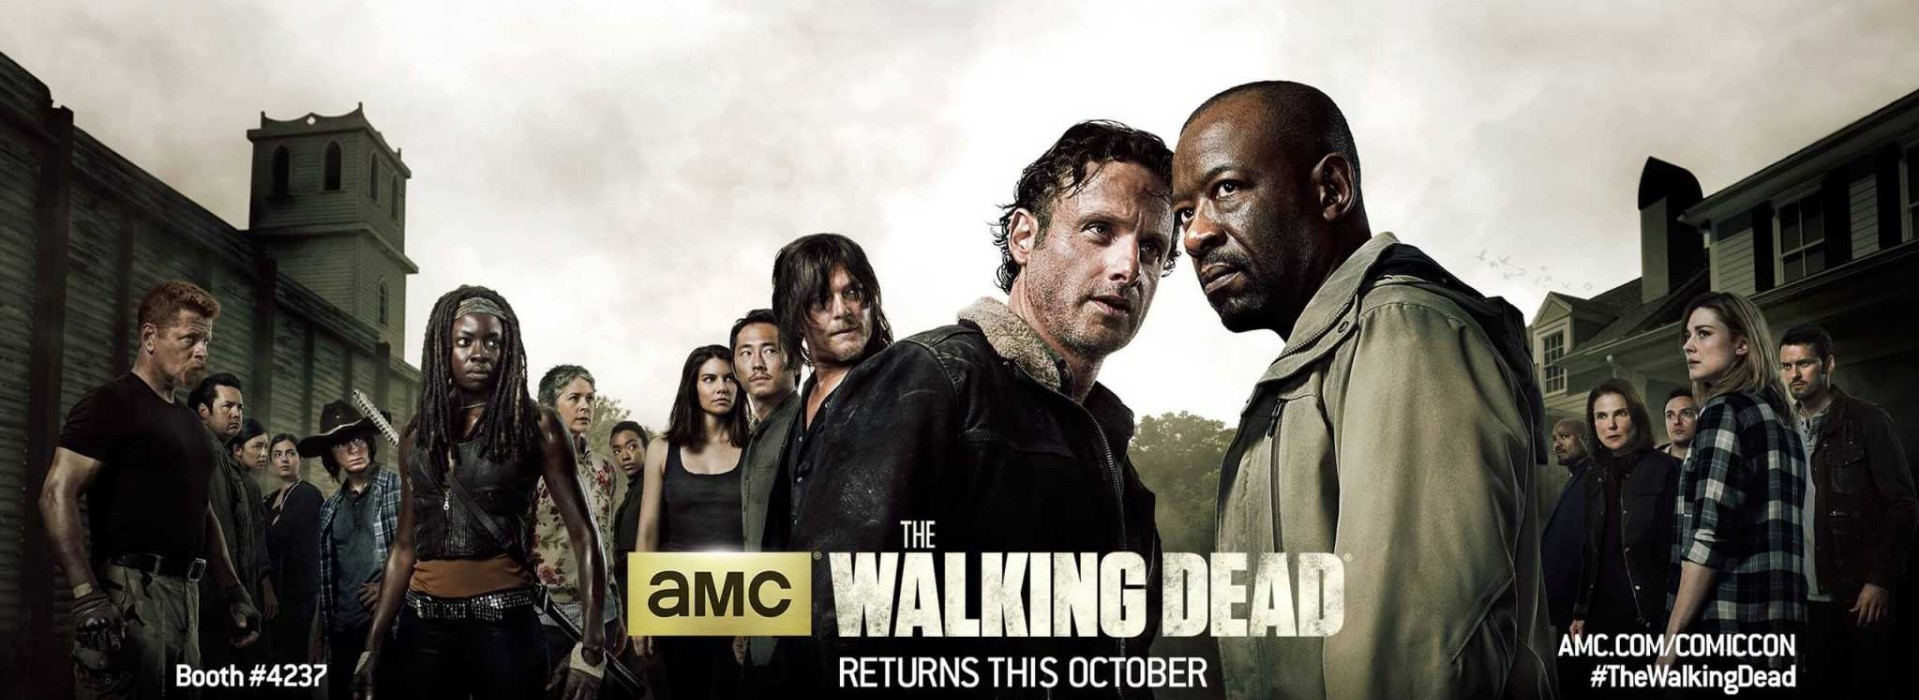 The Walking Dead Season 6 720p cover